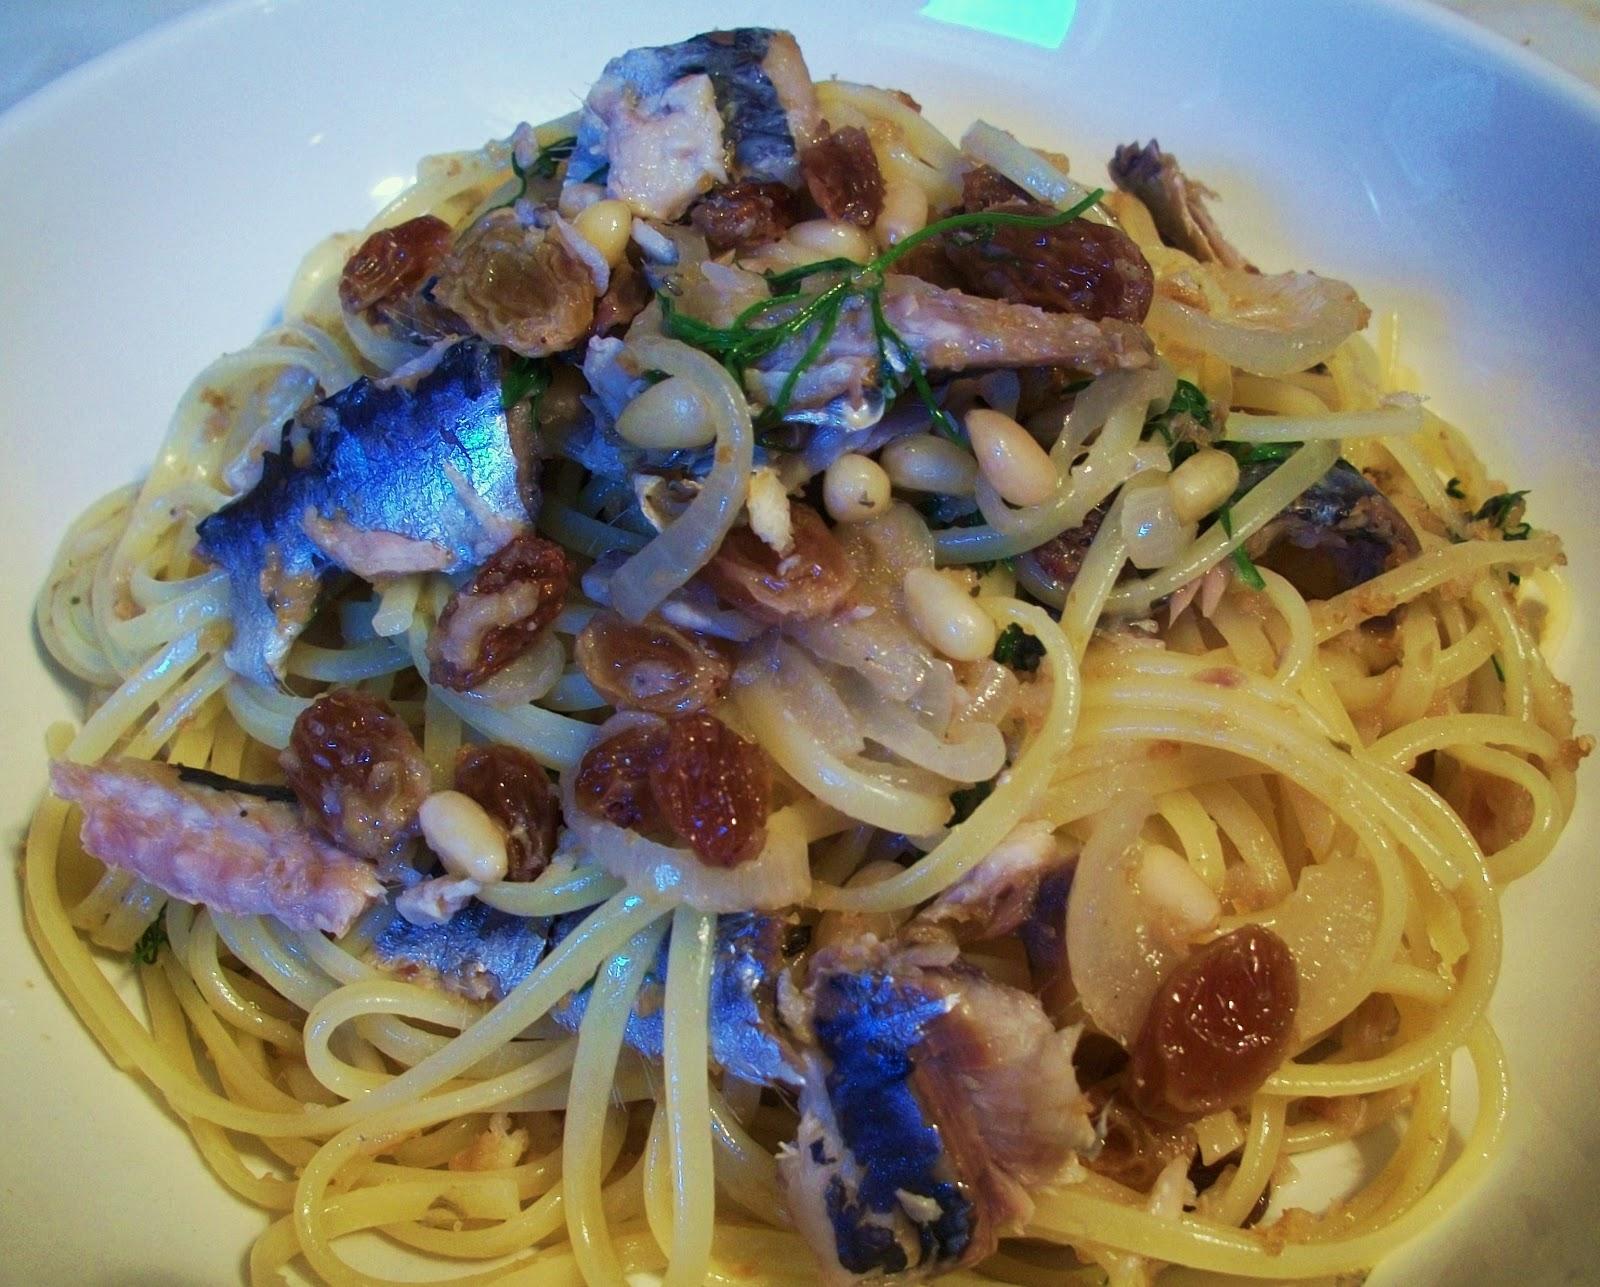 Passione Per Cucina: Pasta Con Le Sarde (Sicilian Pasta With Sardines)